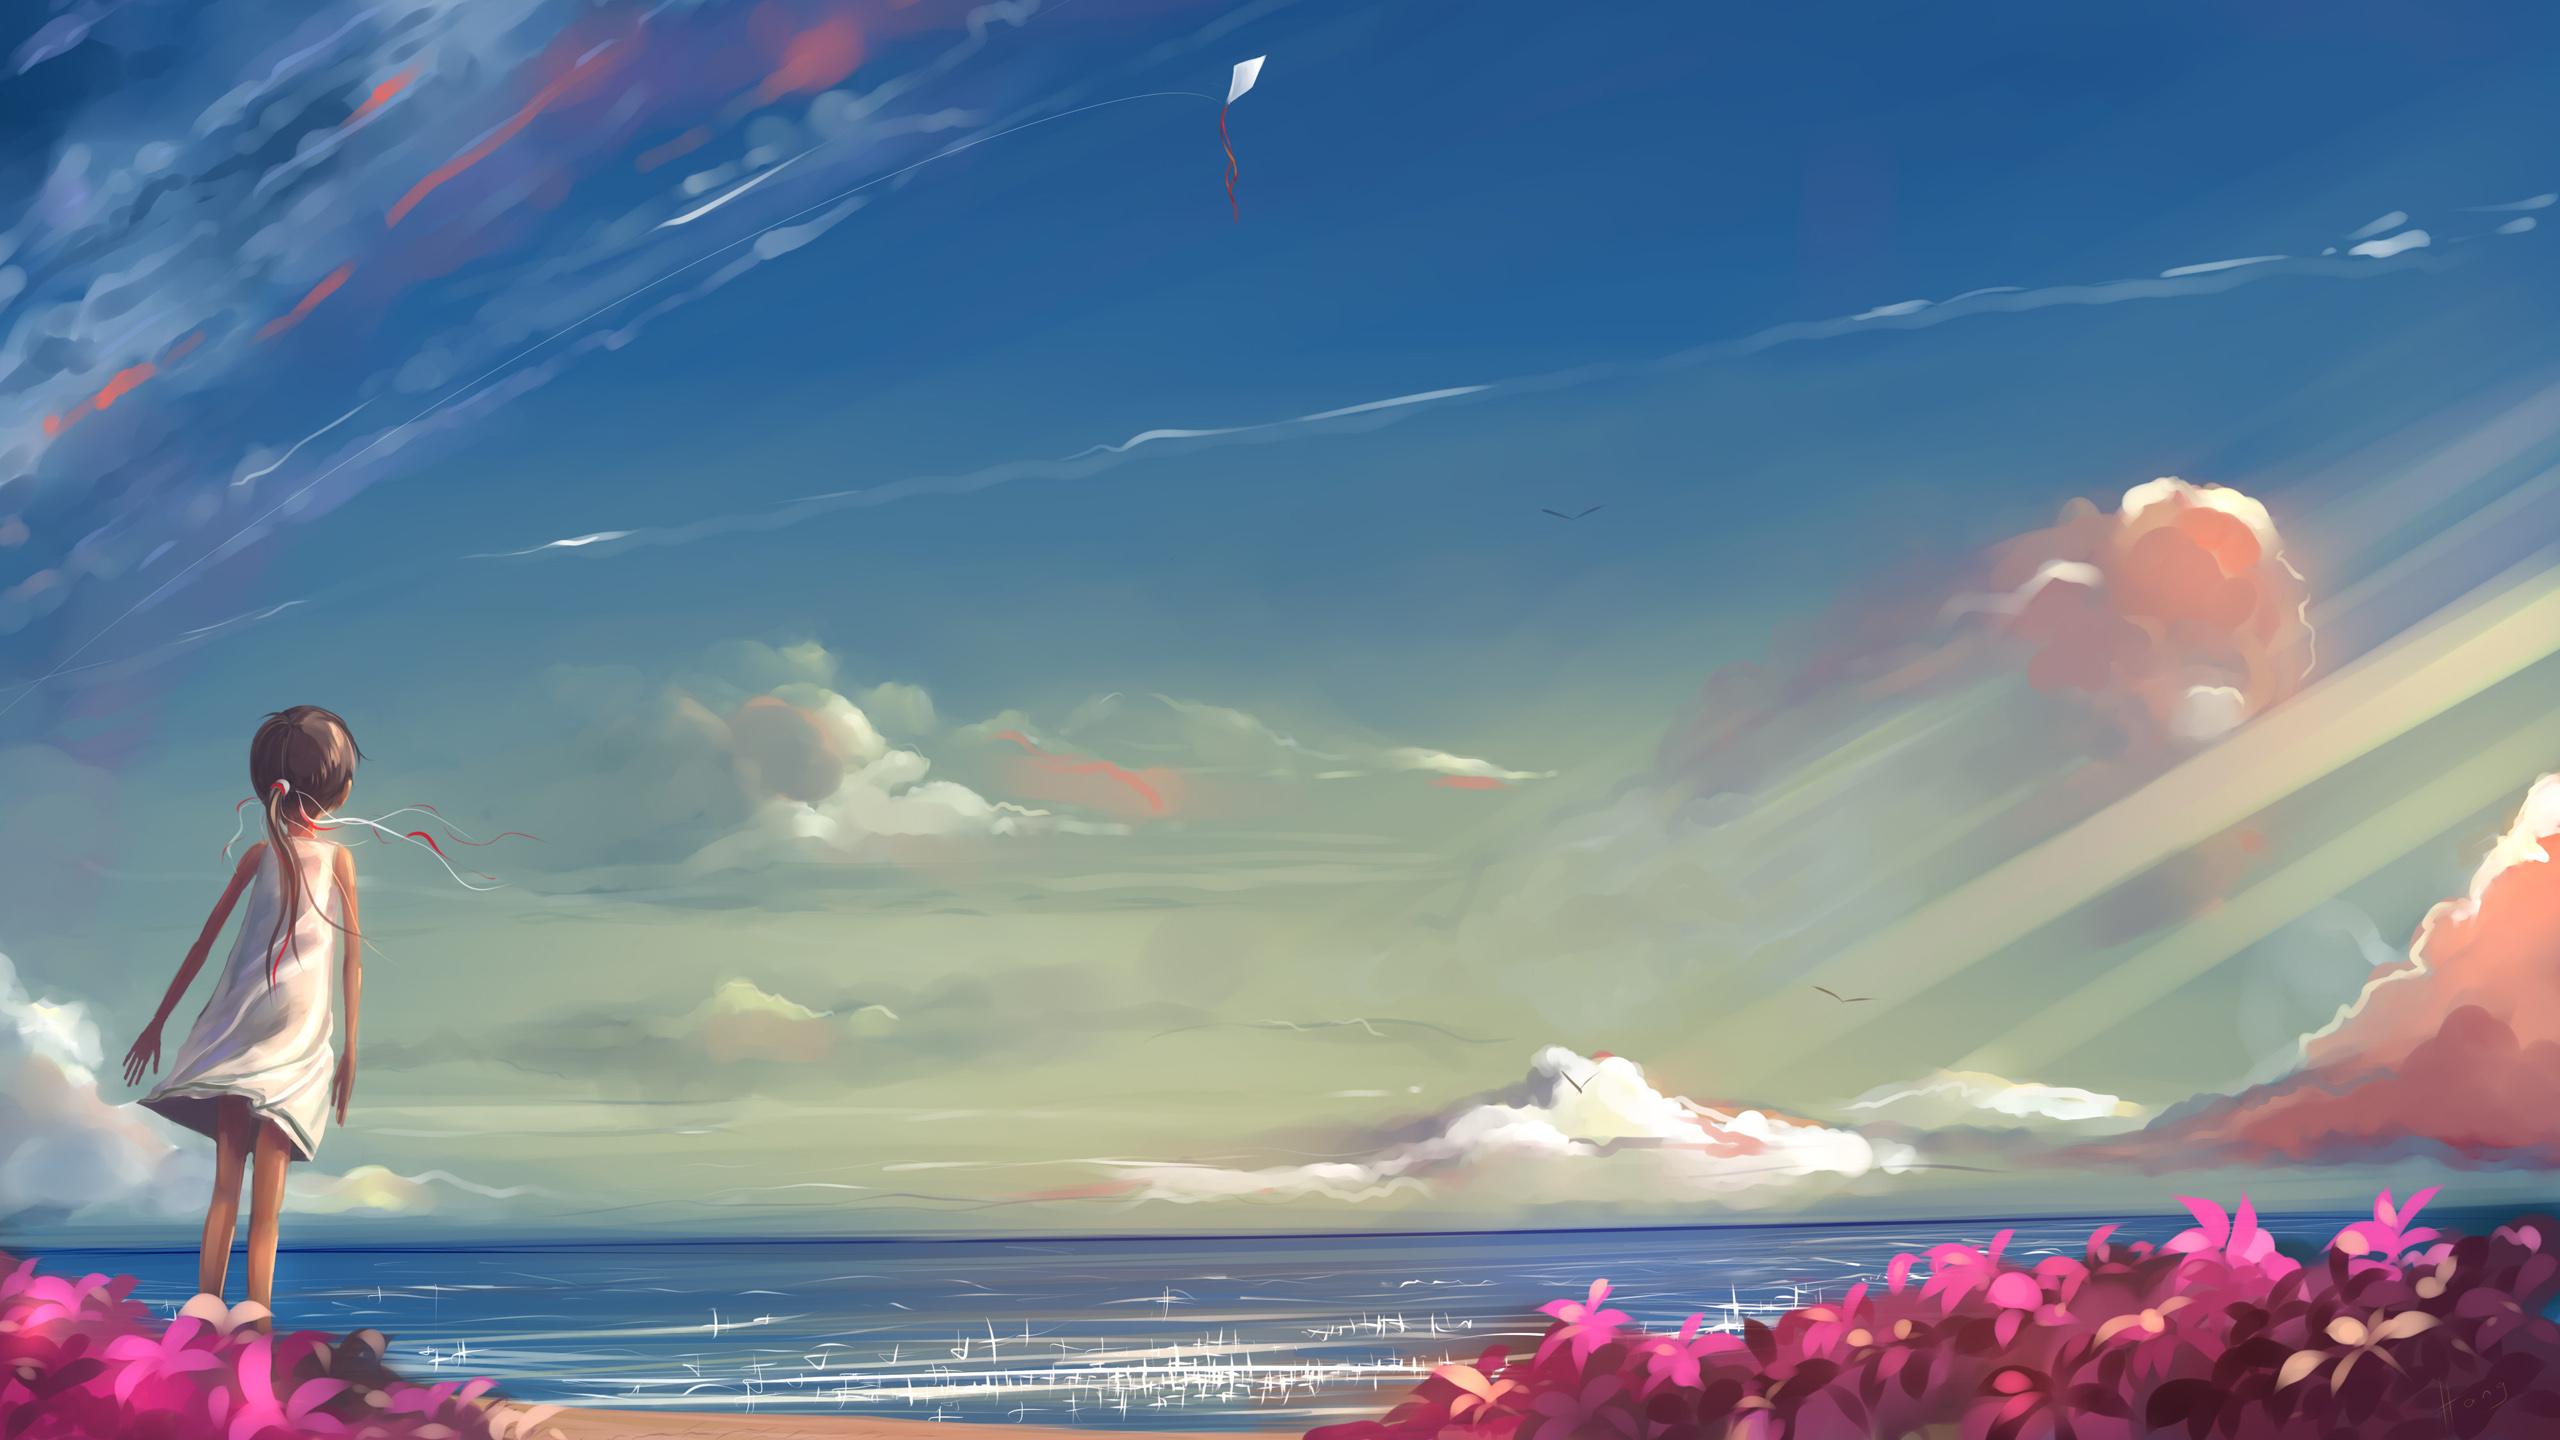 Anime drawing clouds kite ocean beach child original sky - Beach anime girl ...